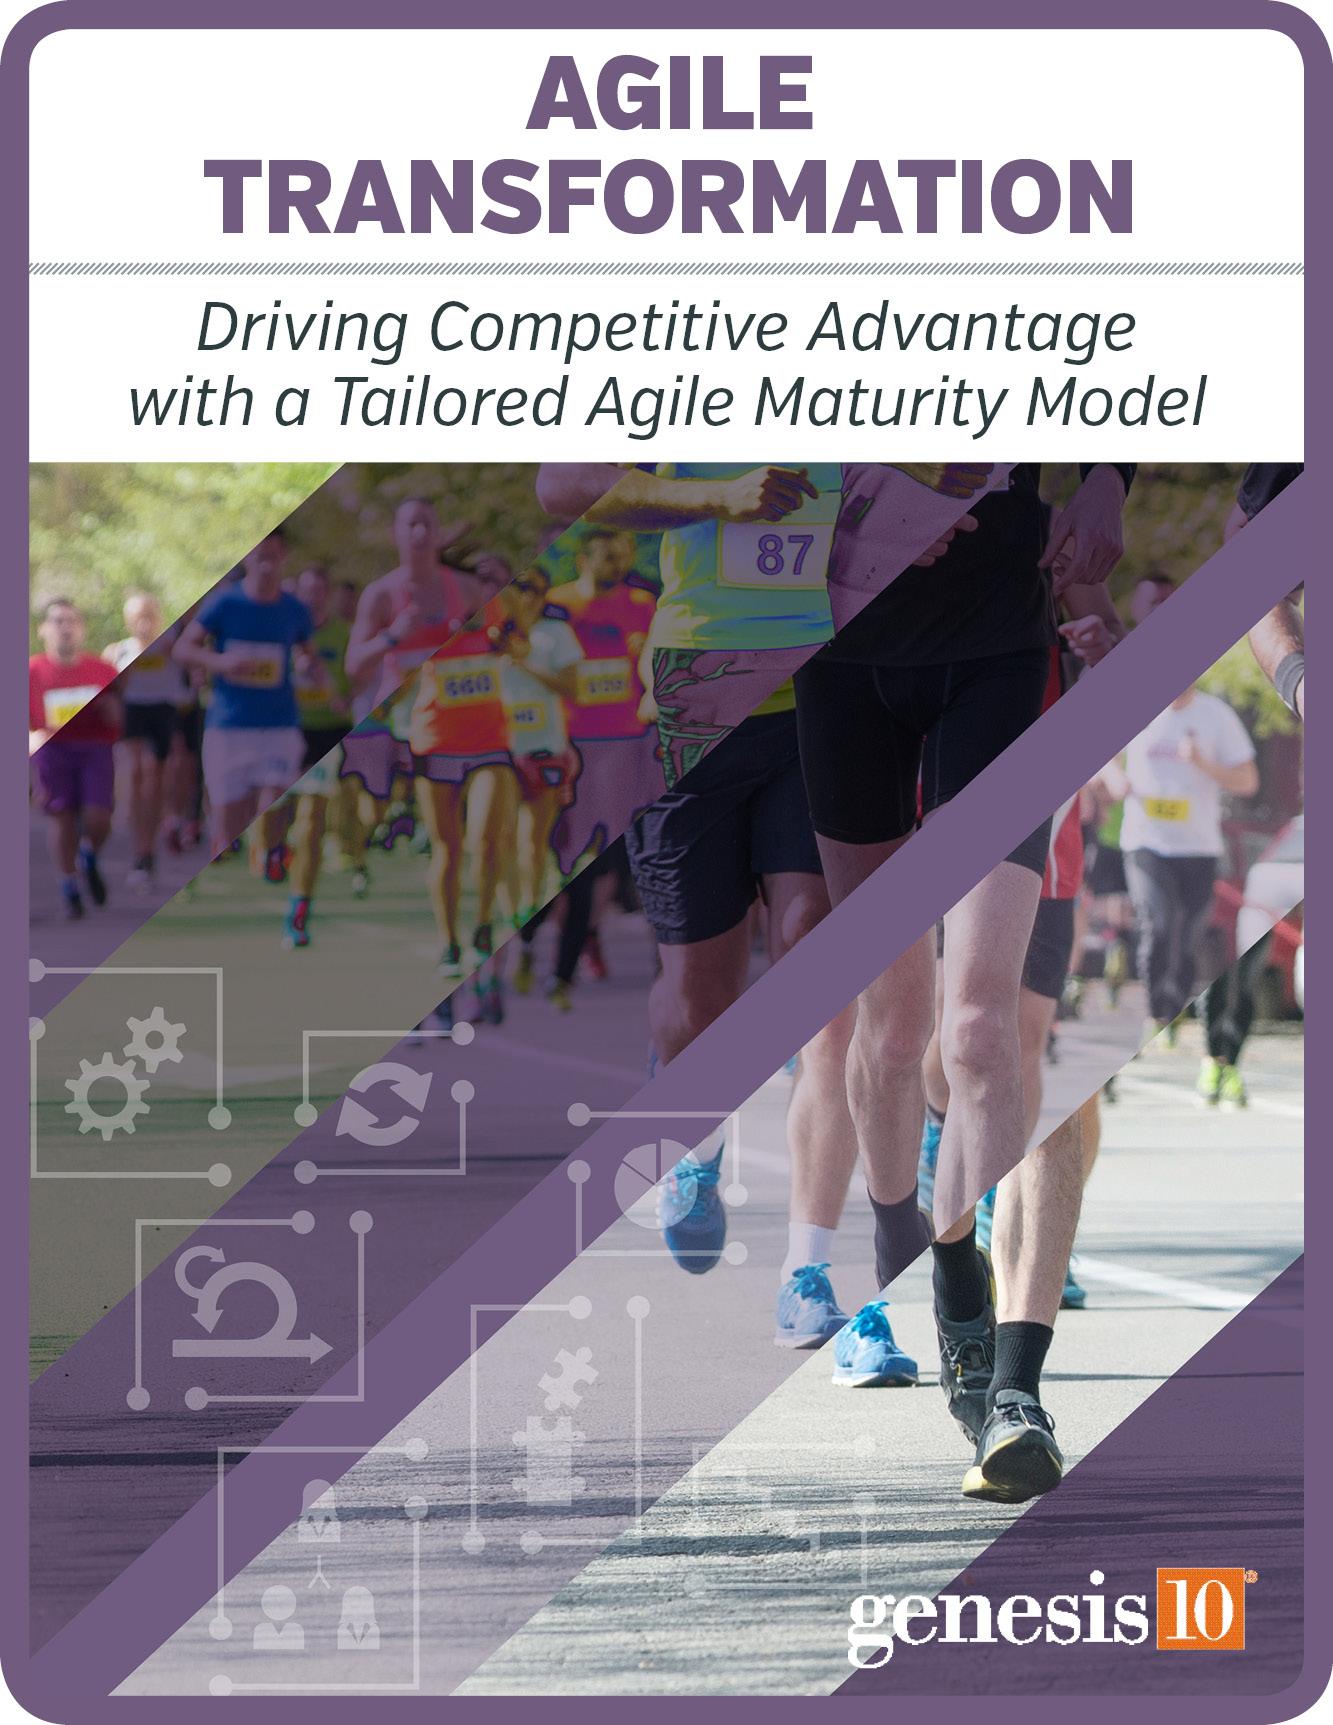 Genesis10 Agile Transformation Whitepaper